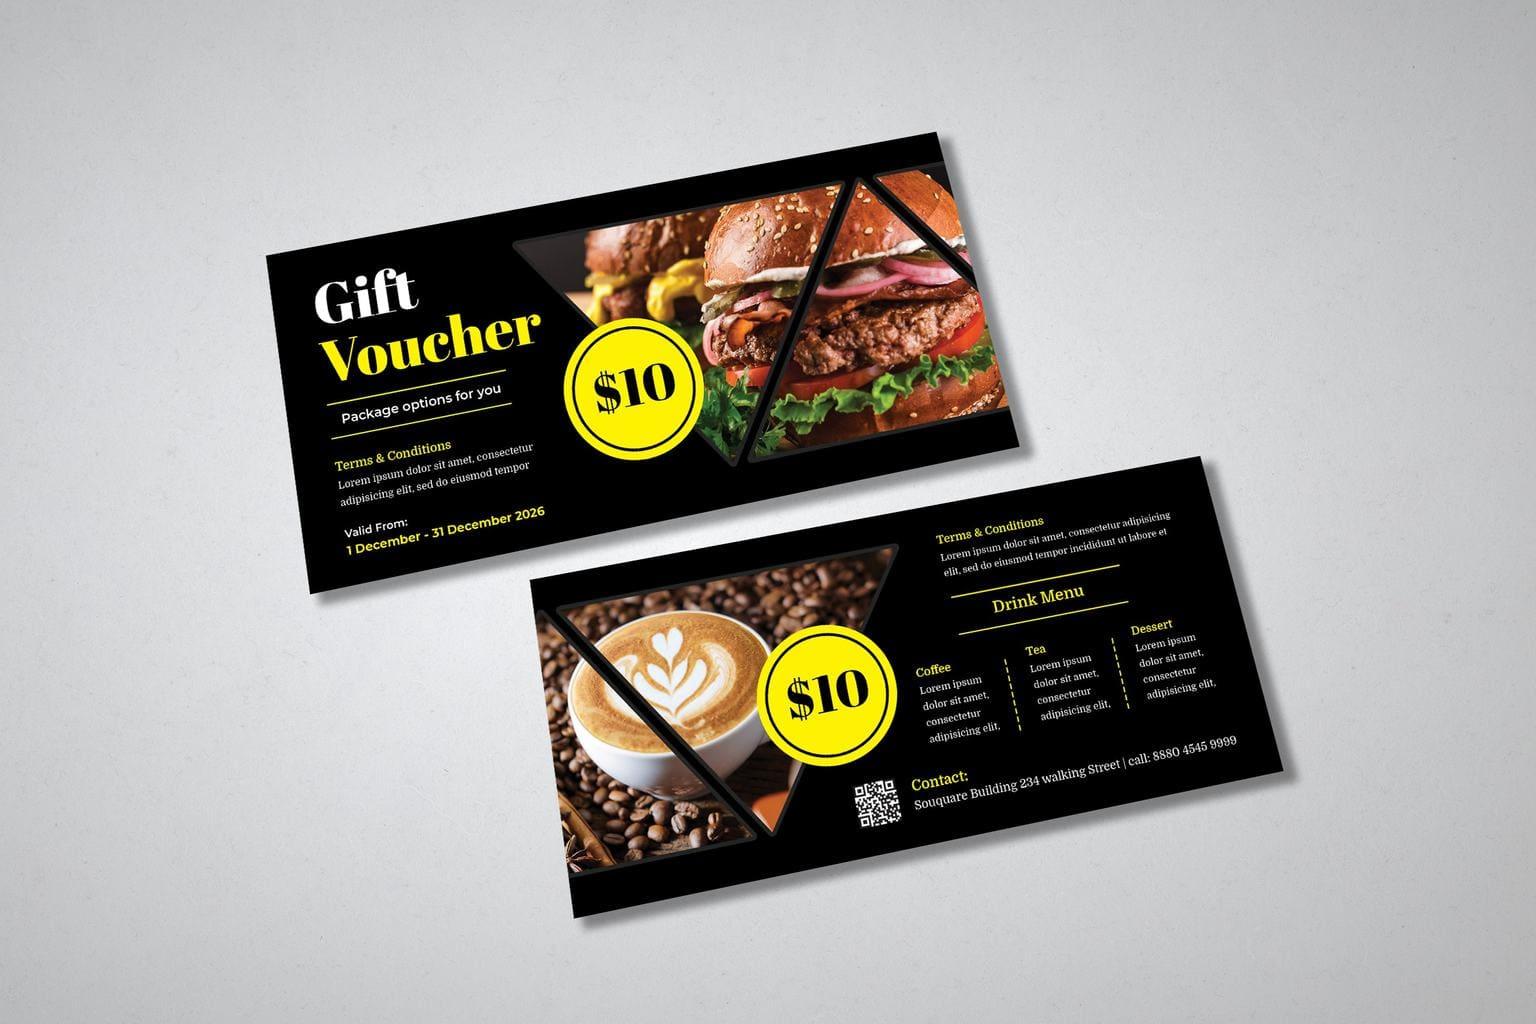 gift card voucher general food drinks